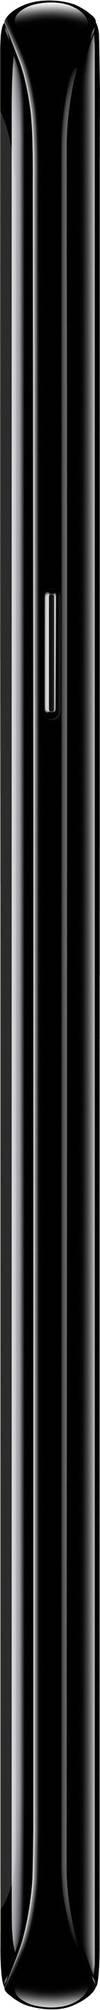 Samsung Galaxy S8+ Single-SIM LTE-Smartphone 15...